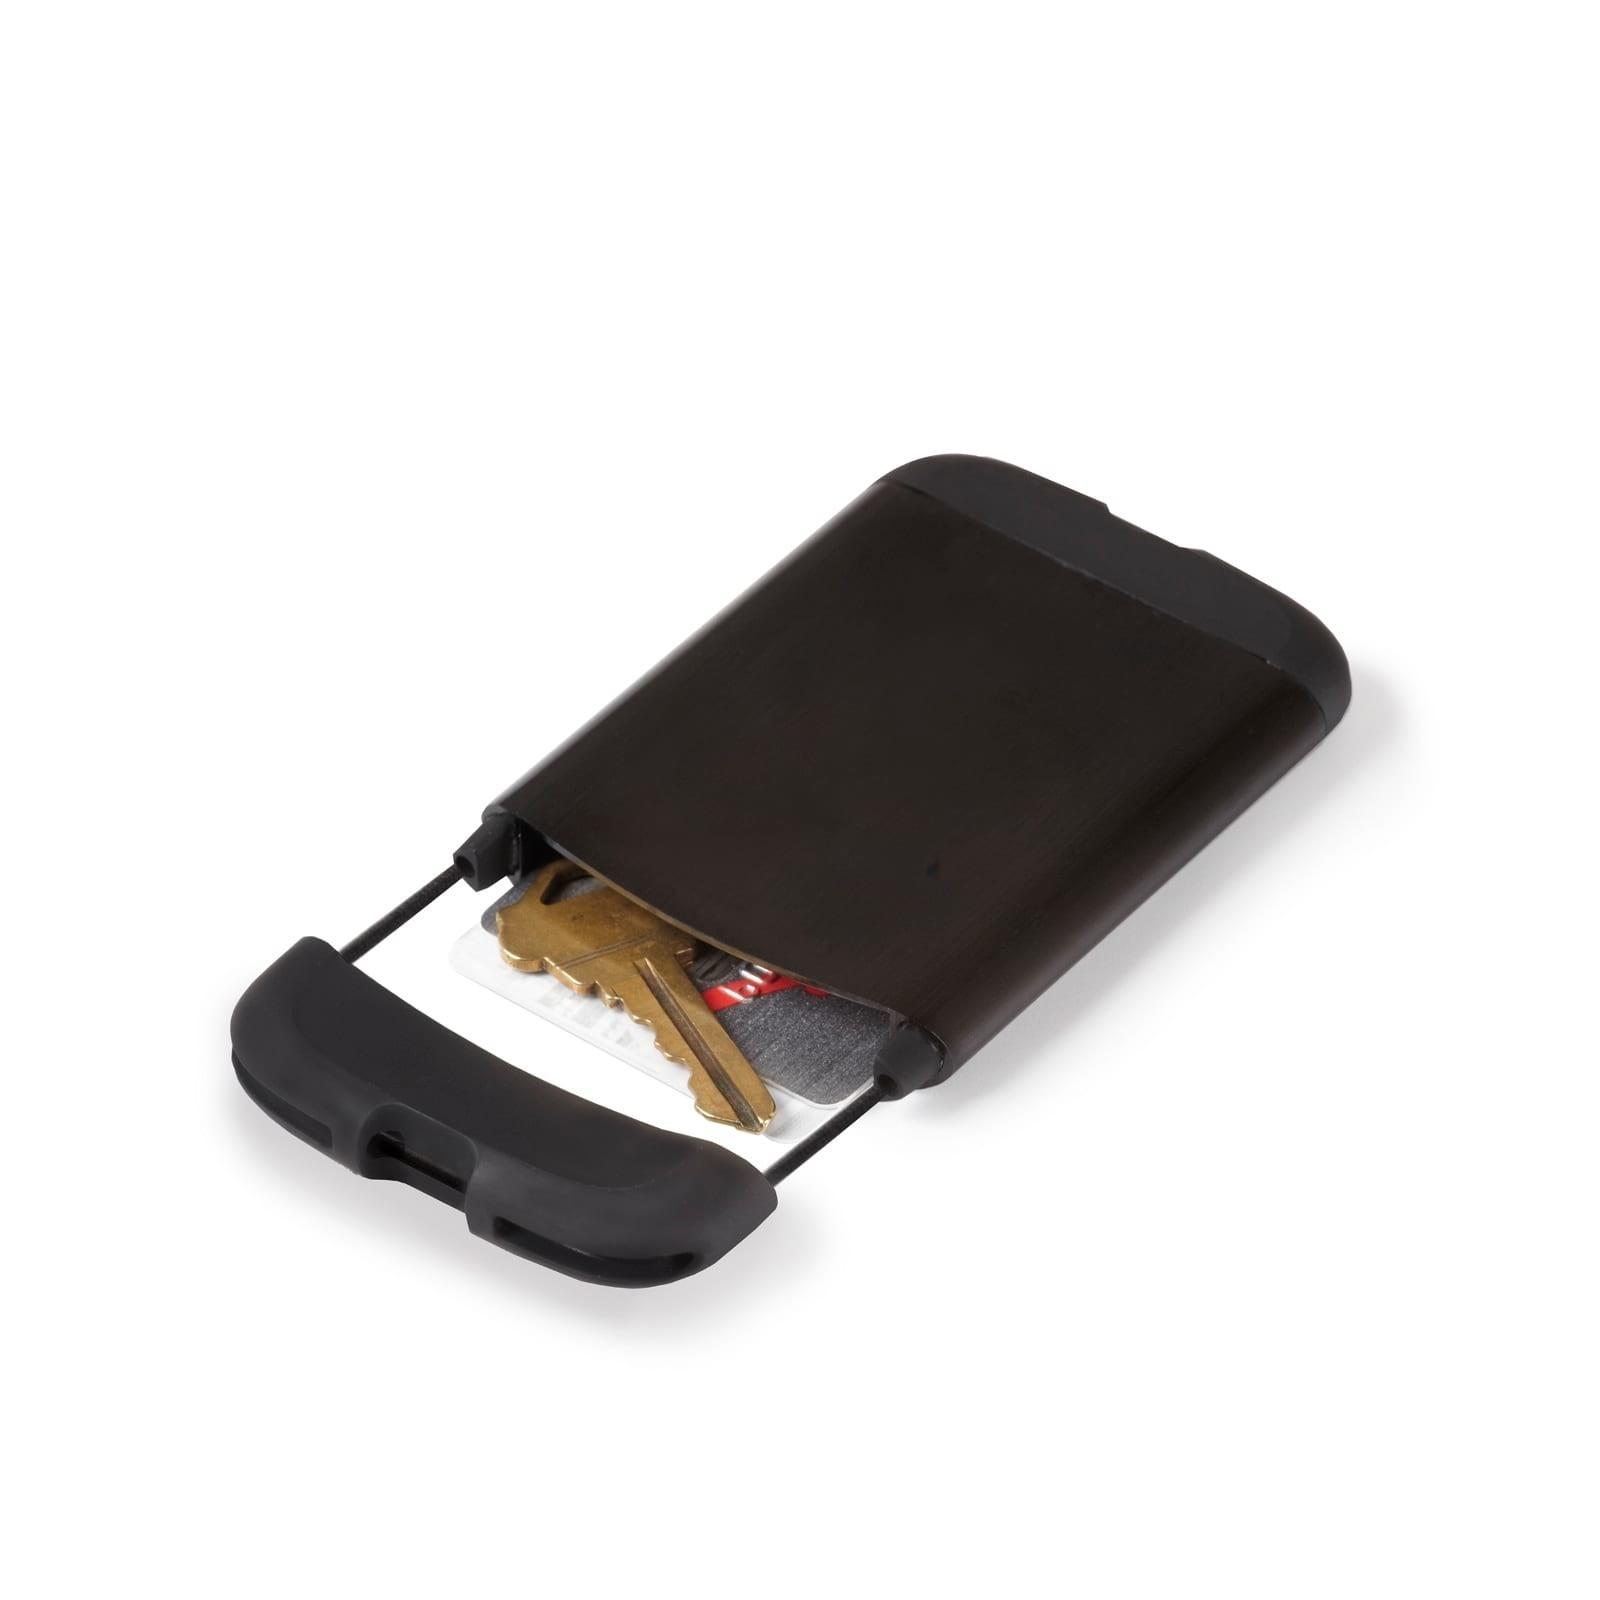 Bungee RFID-Blocking Card Holder Wallet (Black) - Umbra